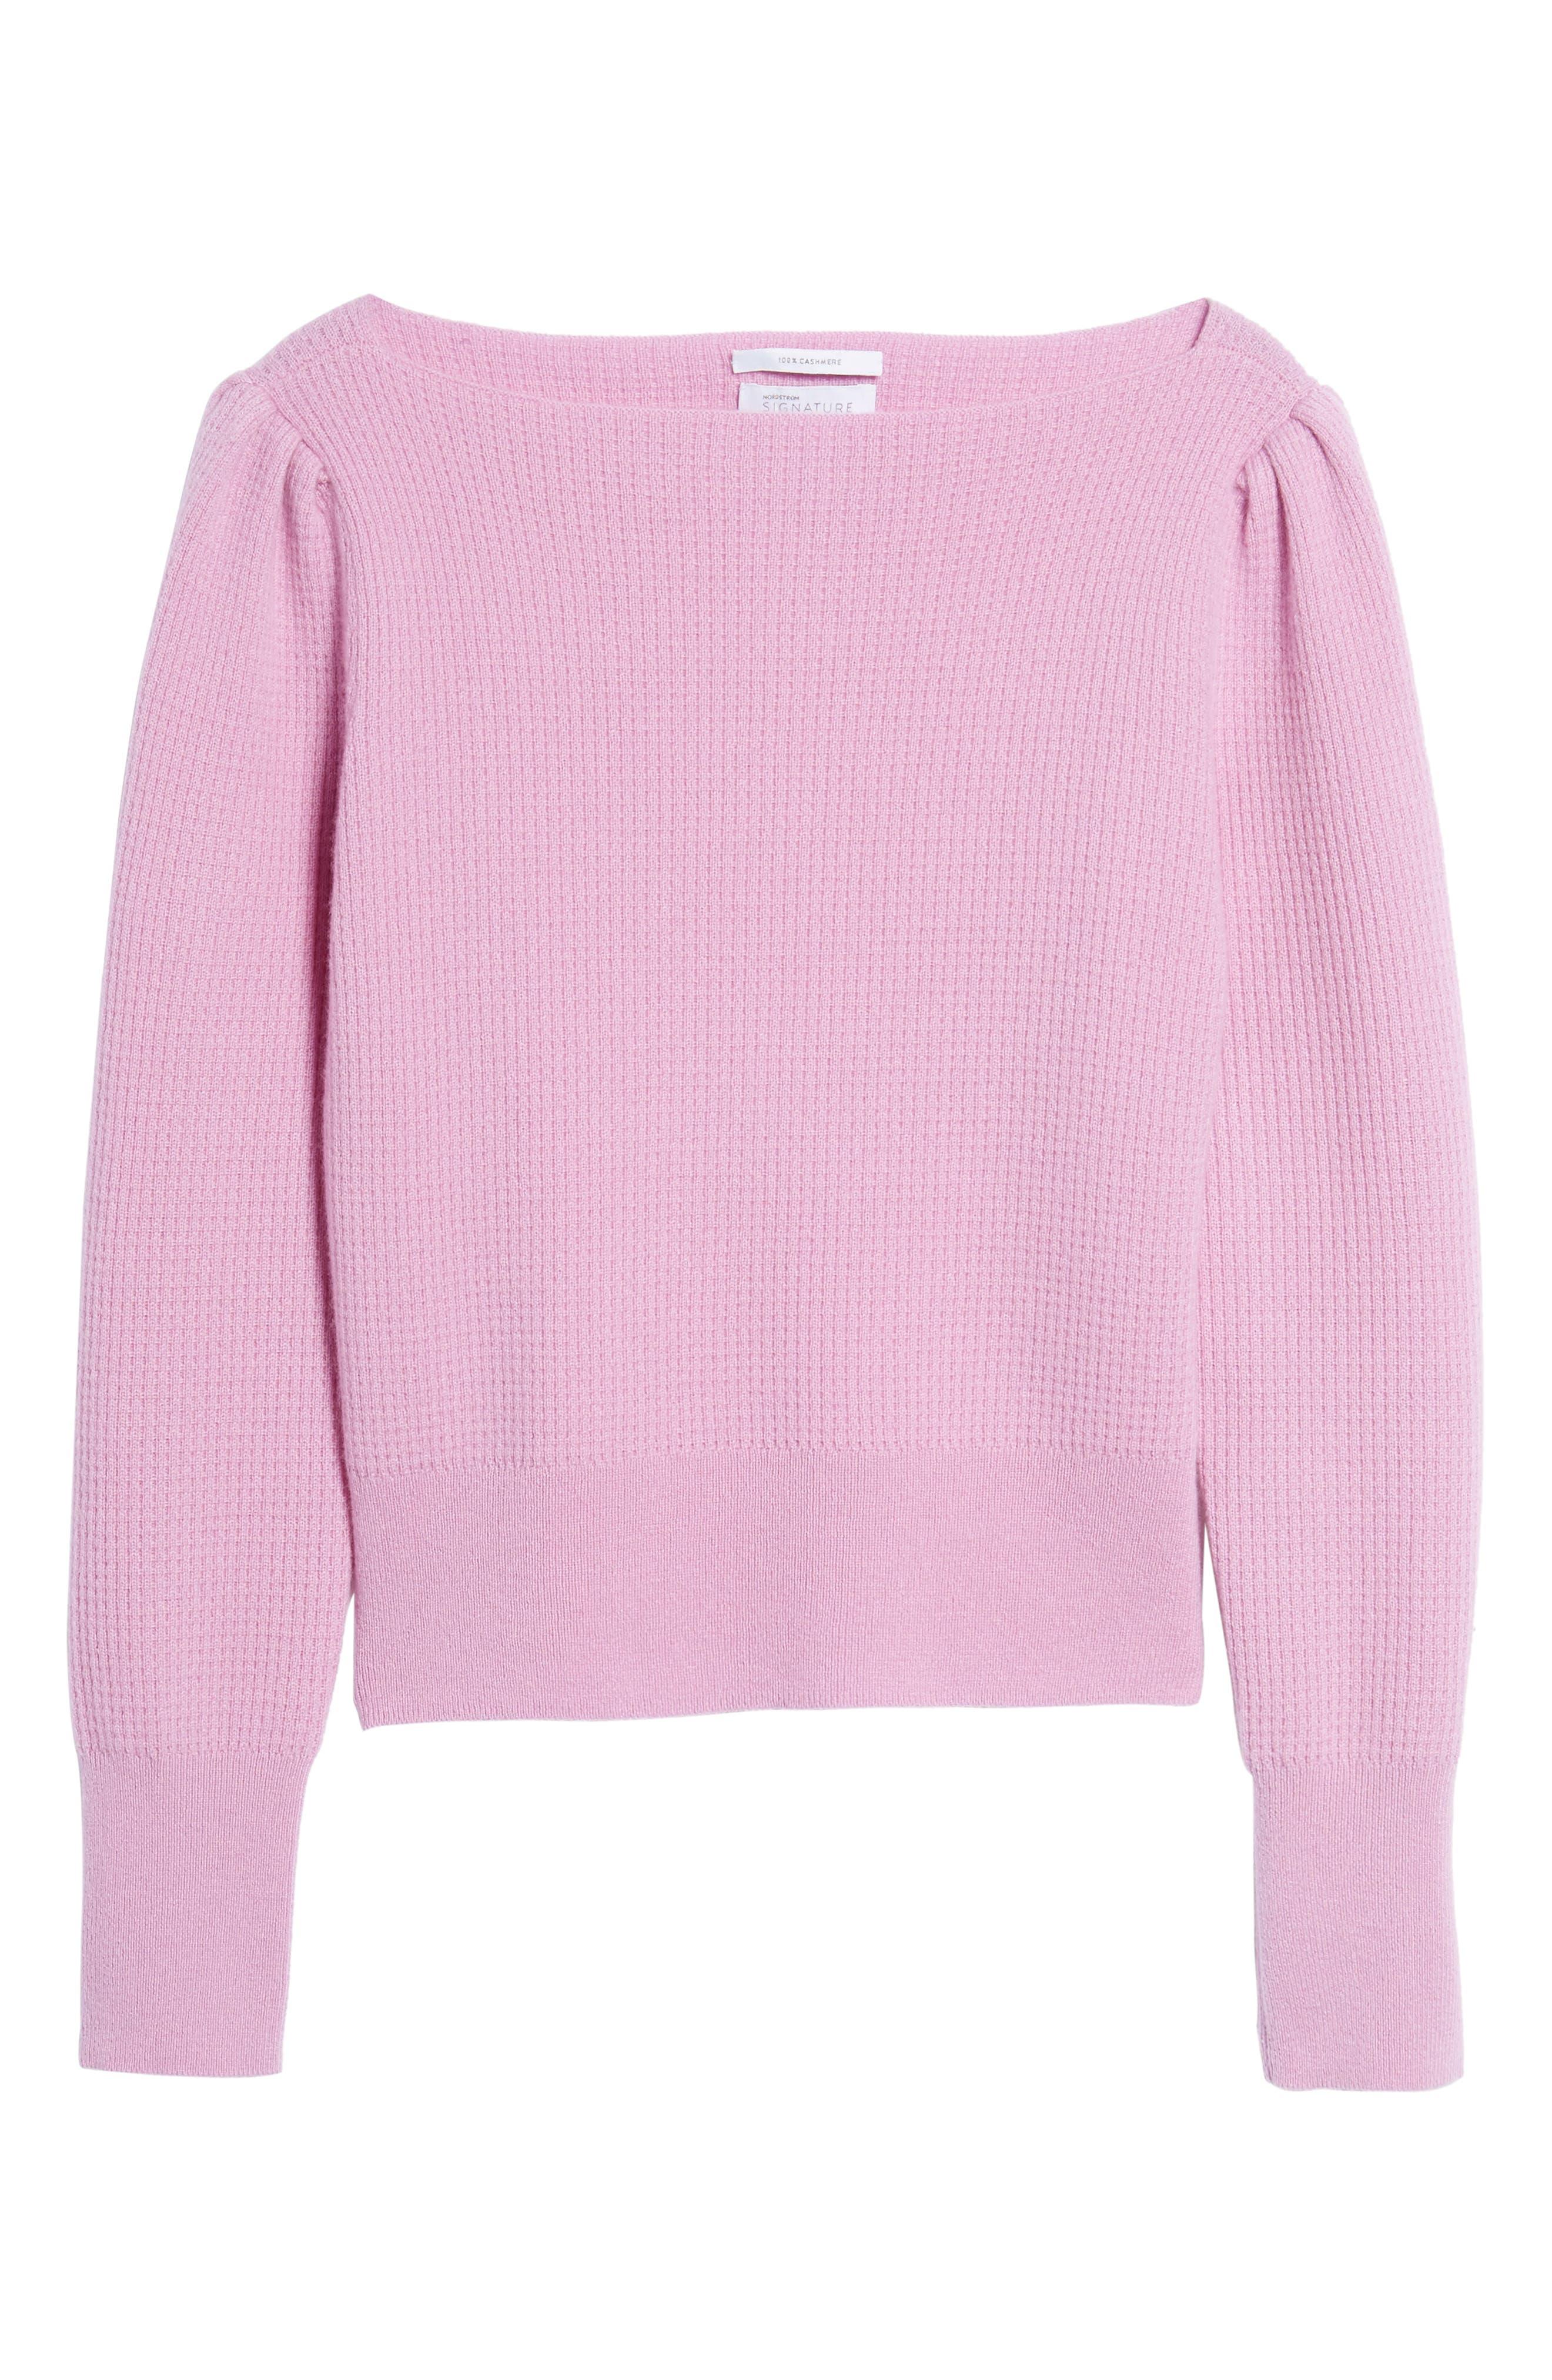 Waffle Stitch Cashmere Sweater,                             Alternate thumbnail 12, color,